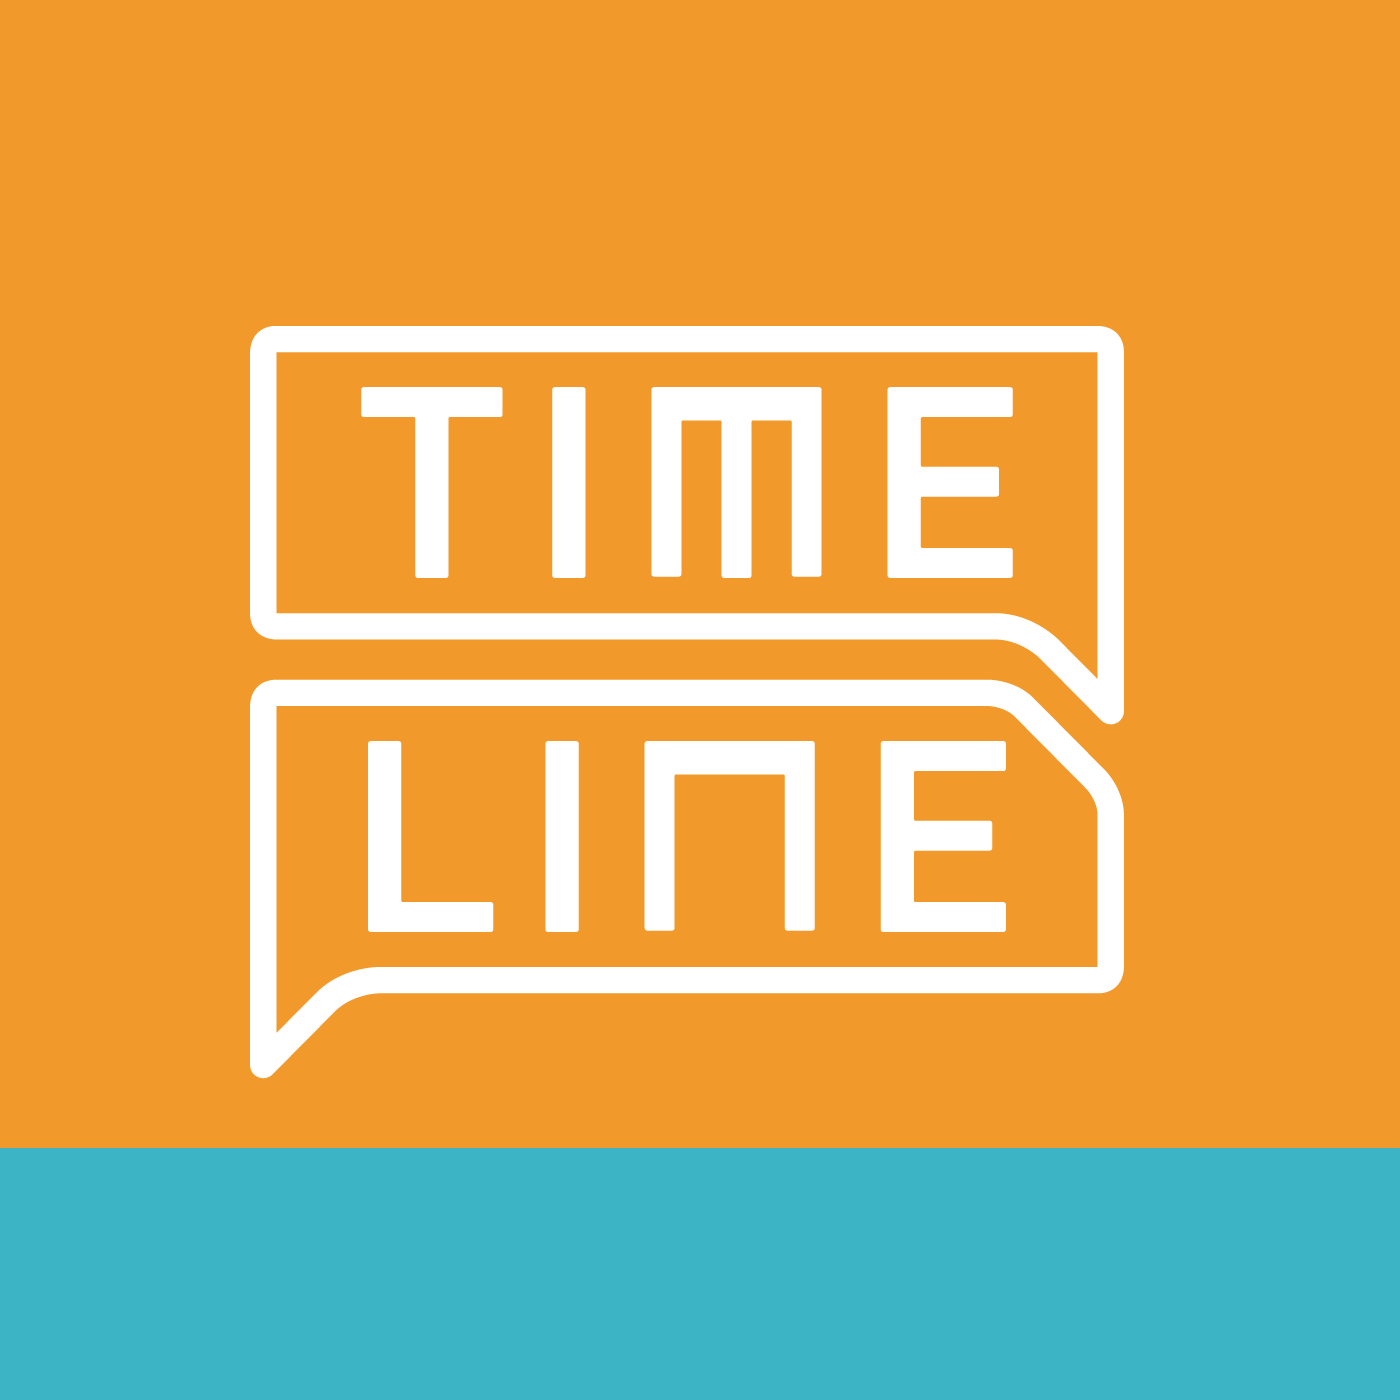 Timeline Gaúcha 25/07/2017